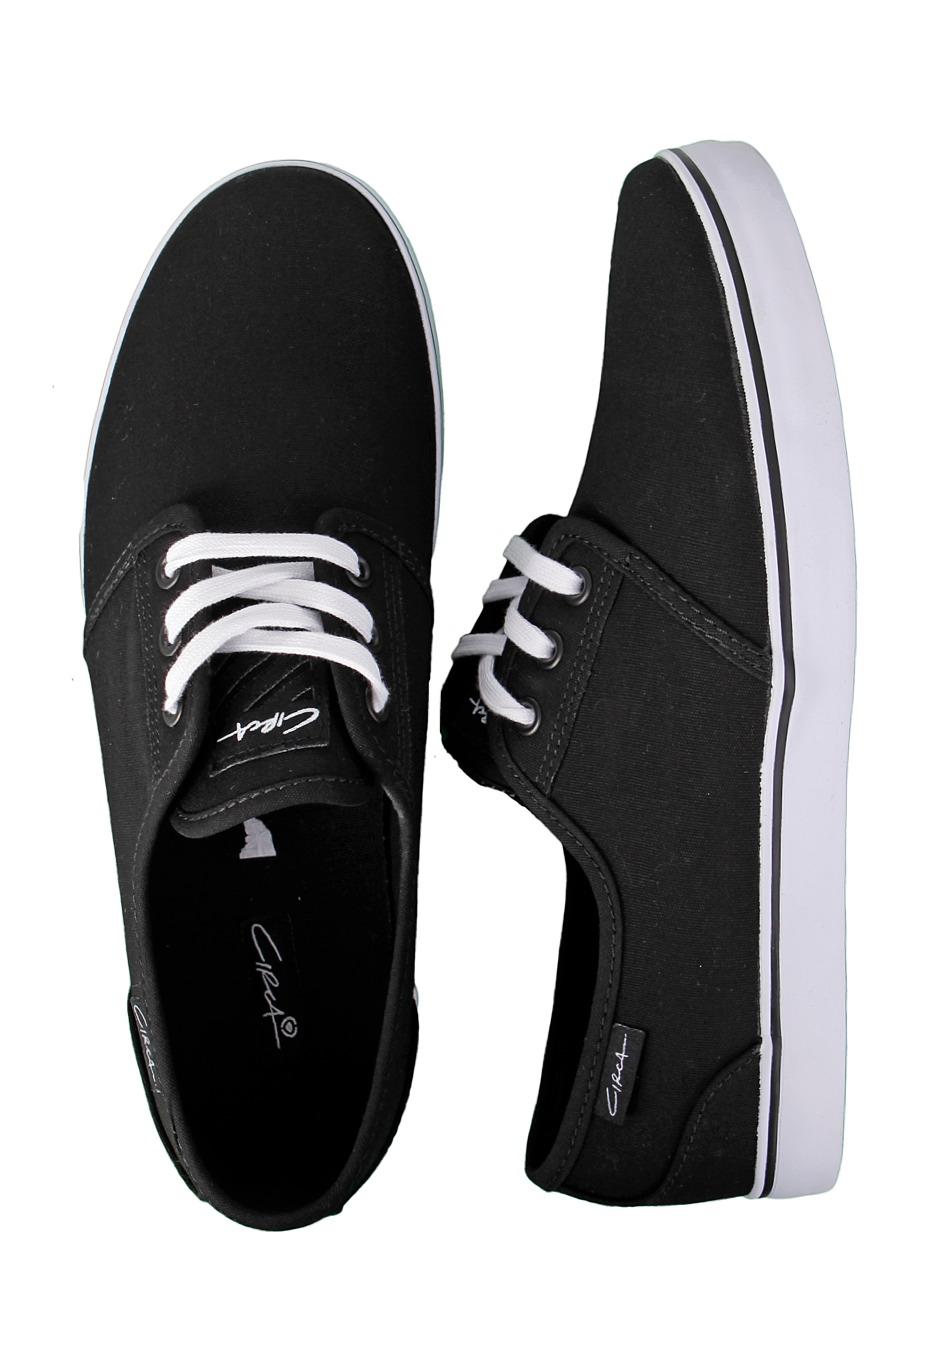 a514b2babb C1RCA - Crip Black White - Shoes - Impericon.com UK